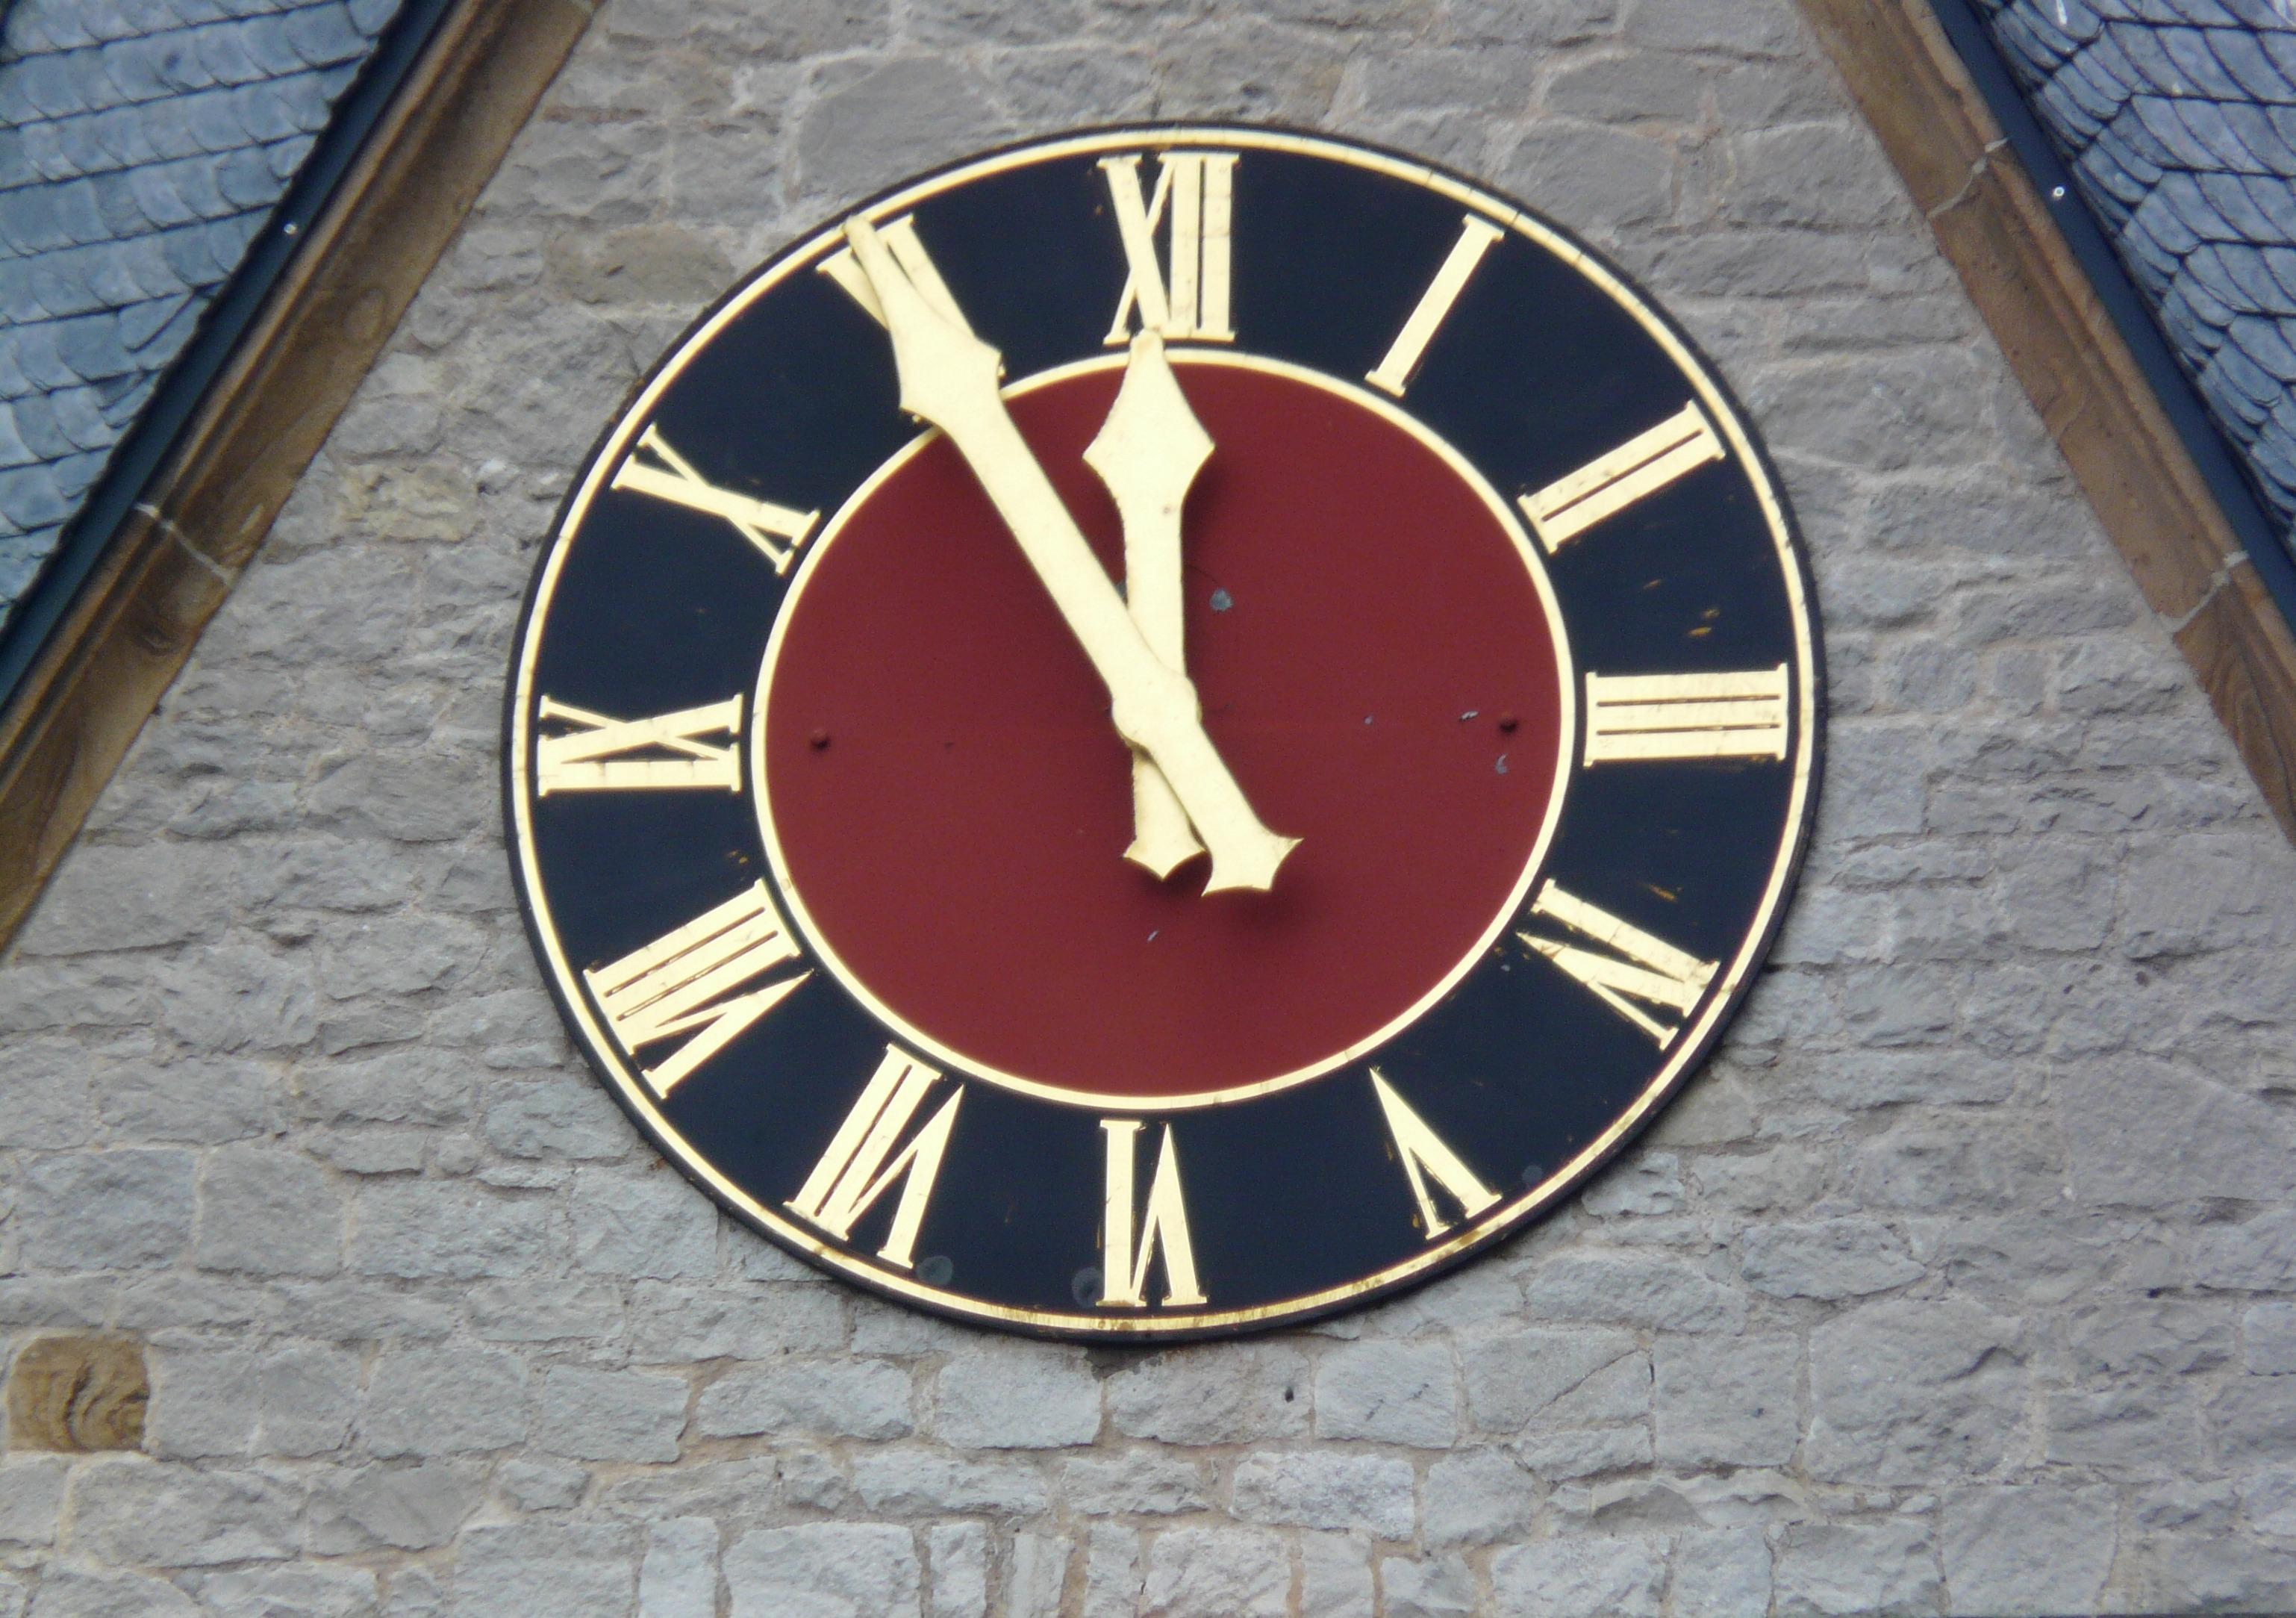 Fotos Gratis Ventana Reloj N Mero Firmar S Mbolo Mueble  # Disenos Vor Muebles